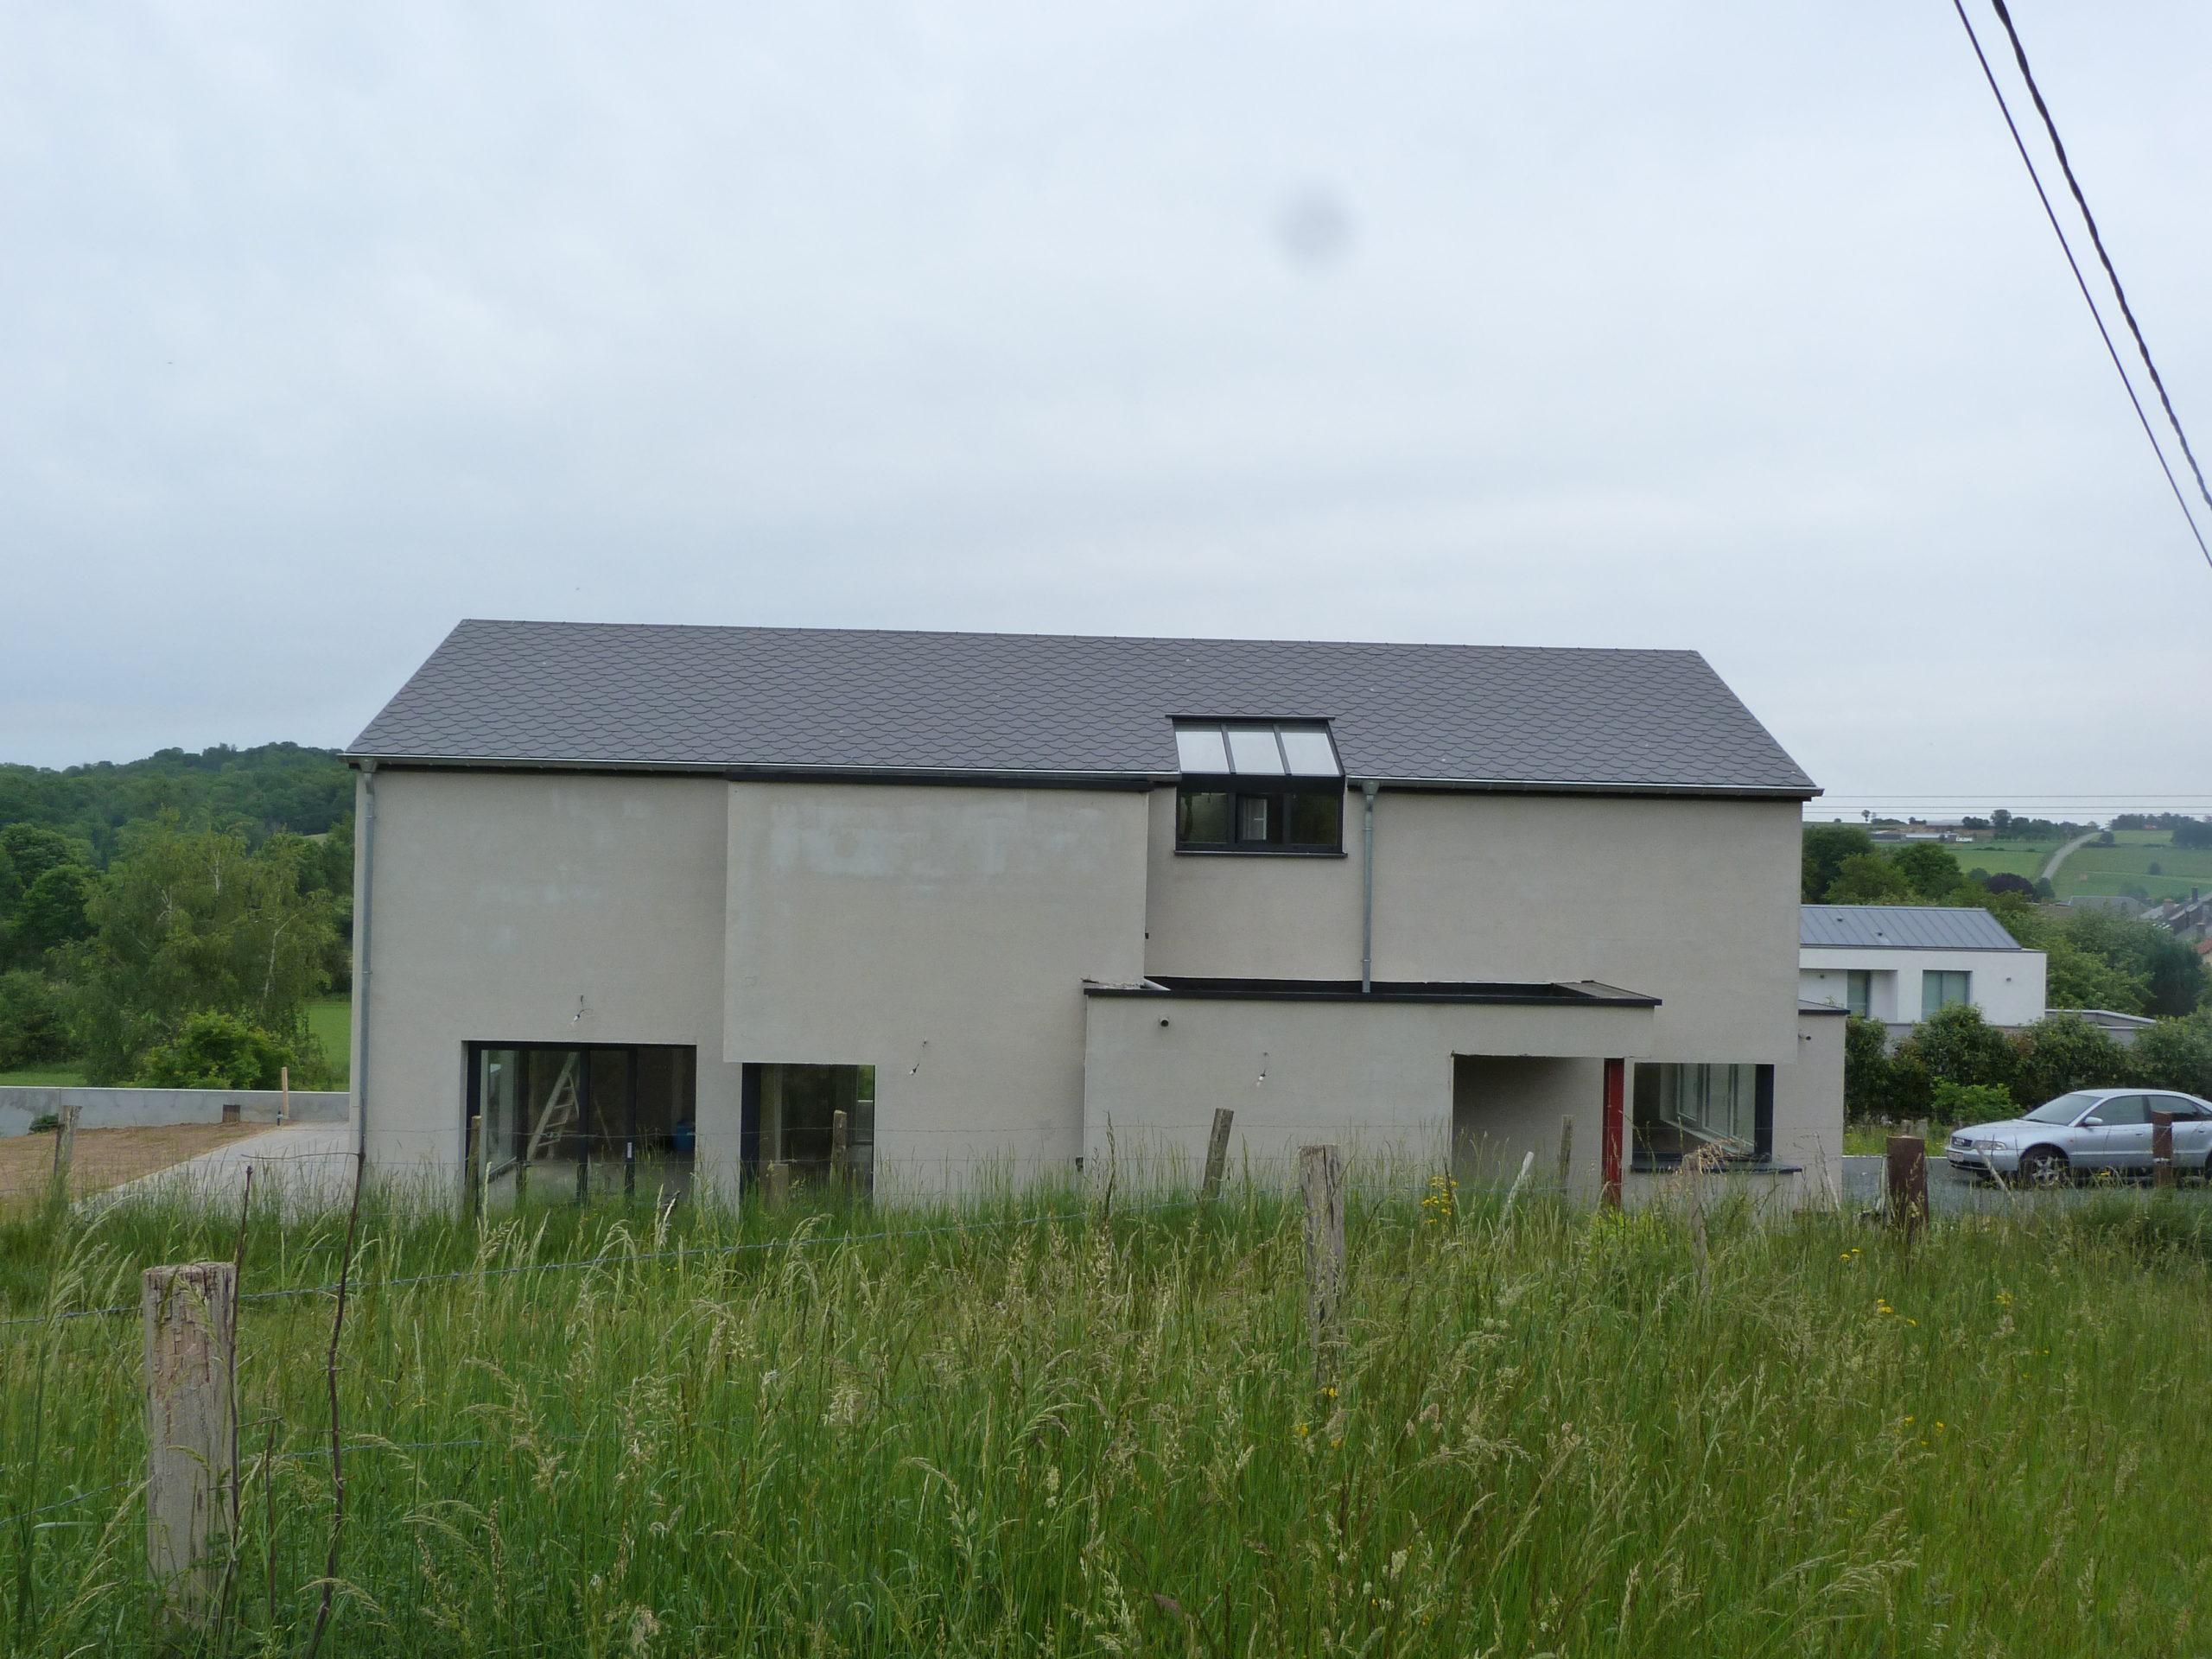 Maison 4 façades à Gomery 4 scaled